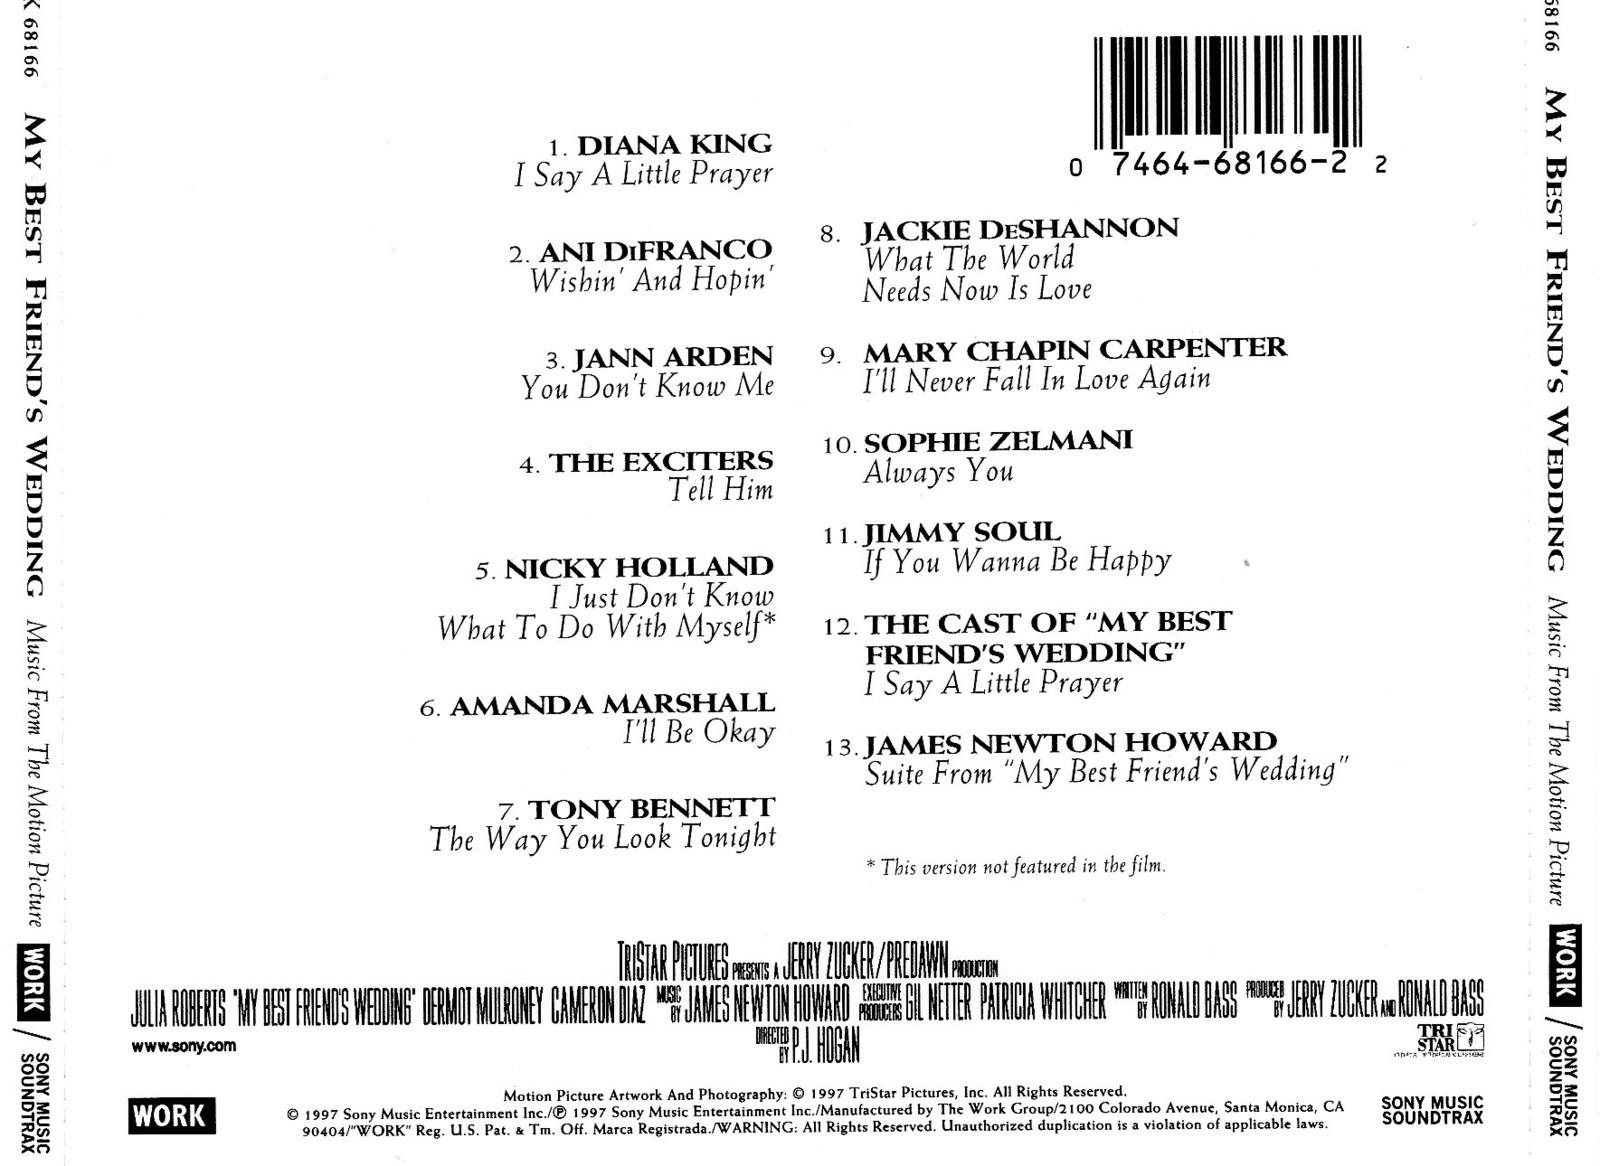 My Best Friend S Wedding Soundtrack.My Best Friend S Wedding O S T 1997年 いつもあなたと